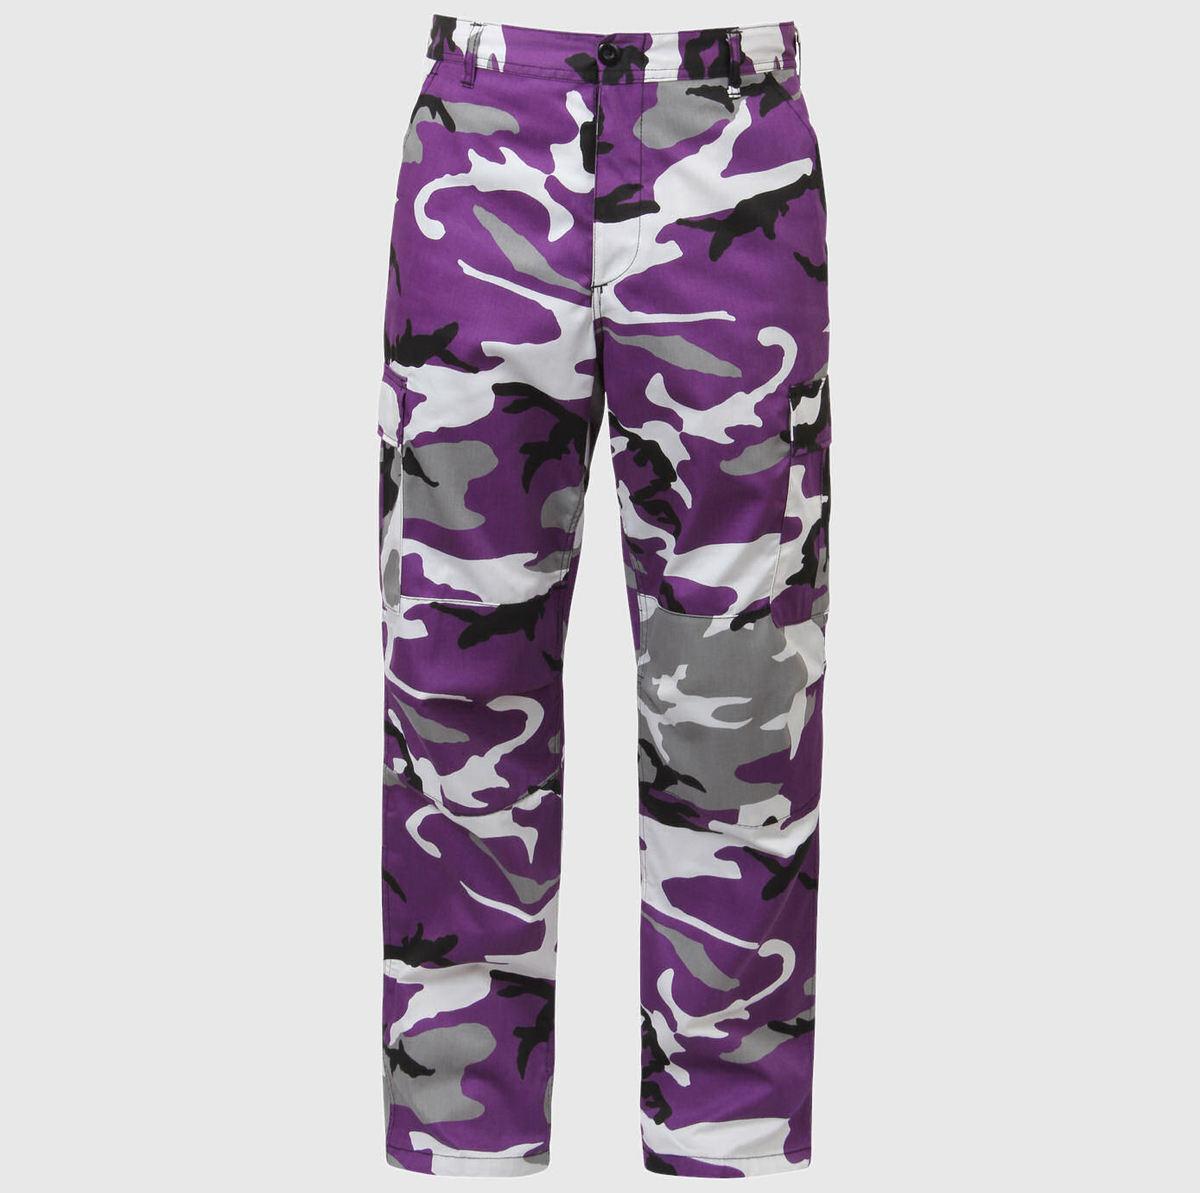 kalhoty pánské ROTHCO - BDU PANT - ULTRA VIOLET CAMO - 7925